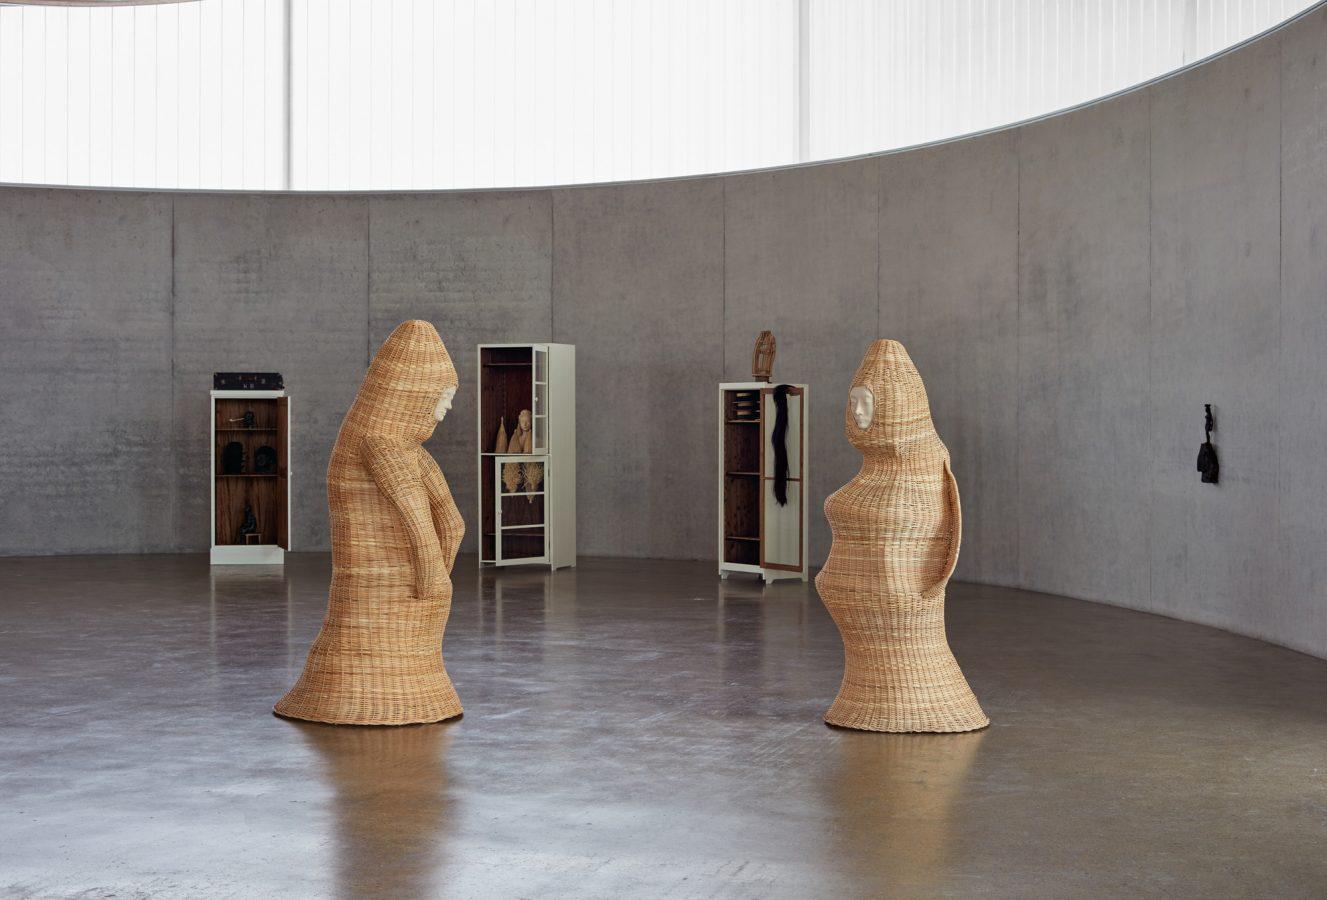 Galeria Pedro Cera – Paloma Varga Weisz -